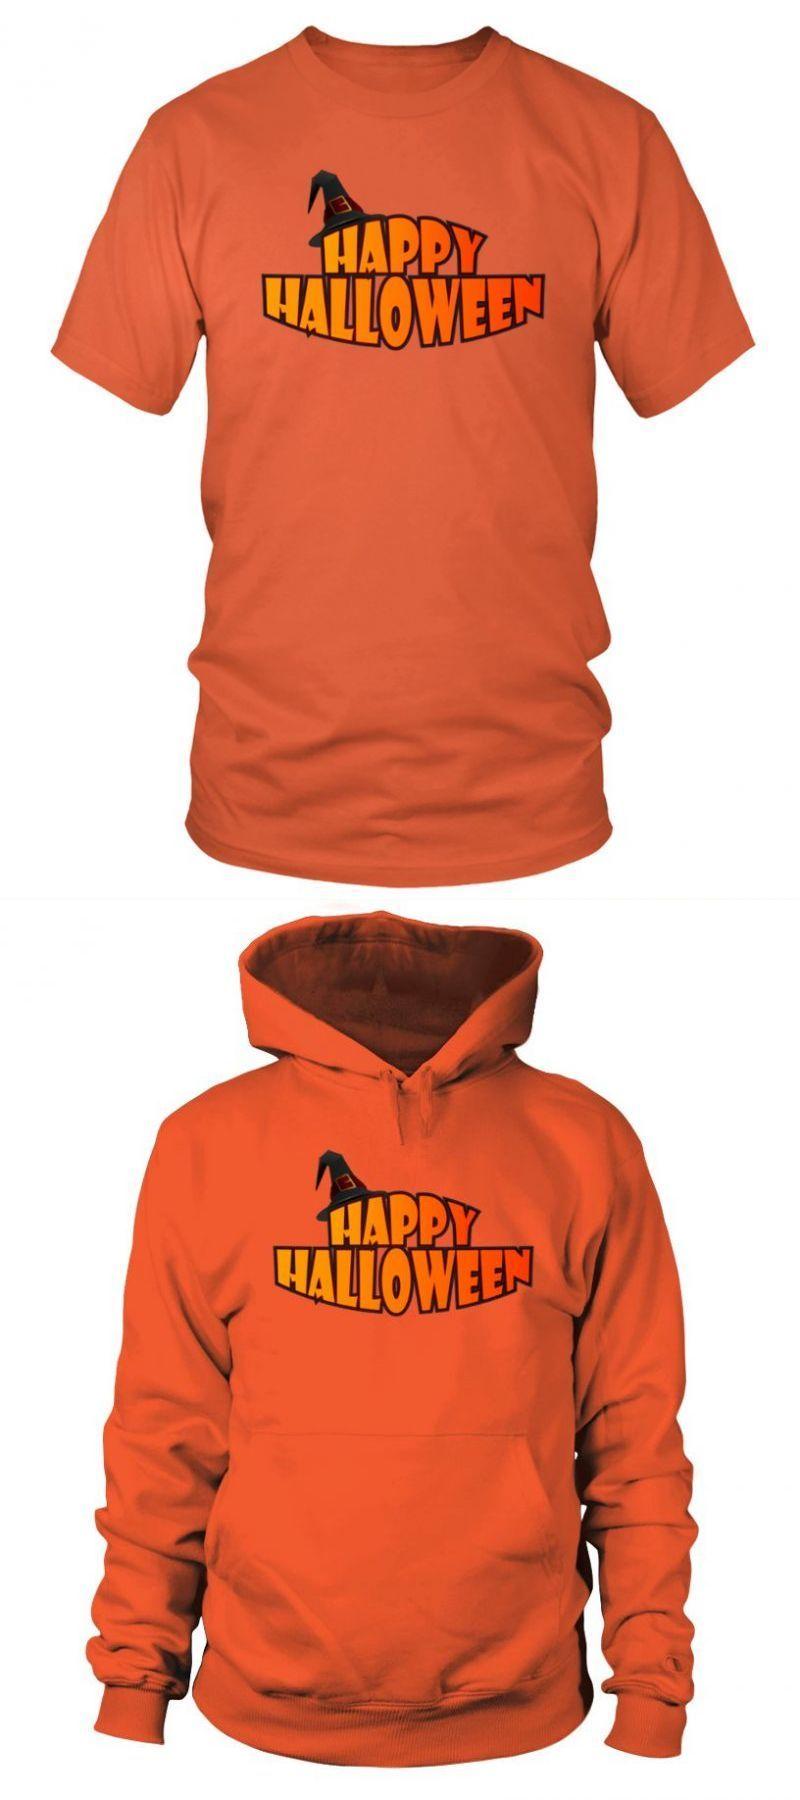 Halloween shirt costumes diy t-shirt happy halloween h&m halloween t shirts #mamp;mcostumediy